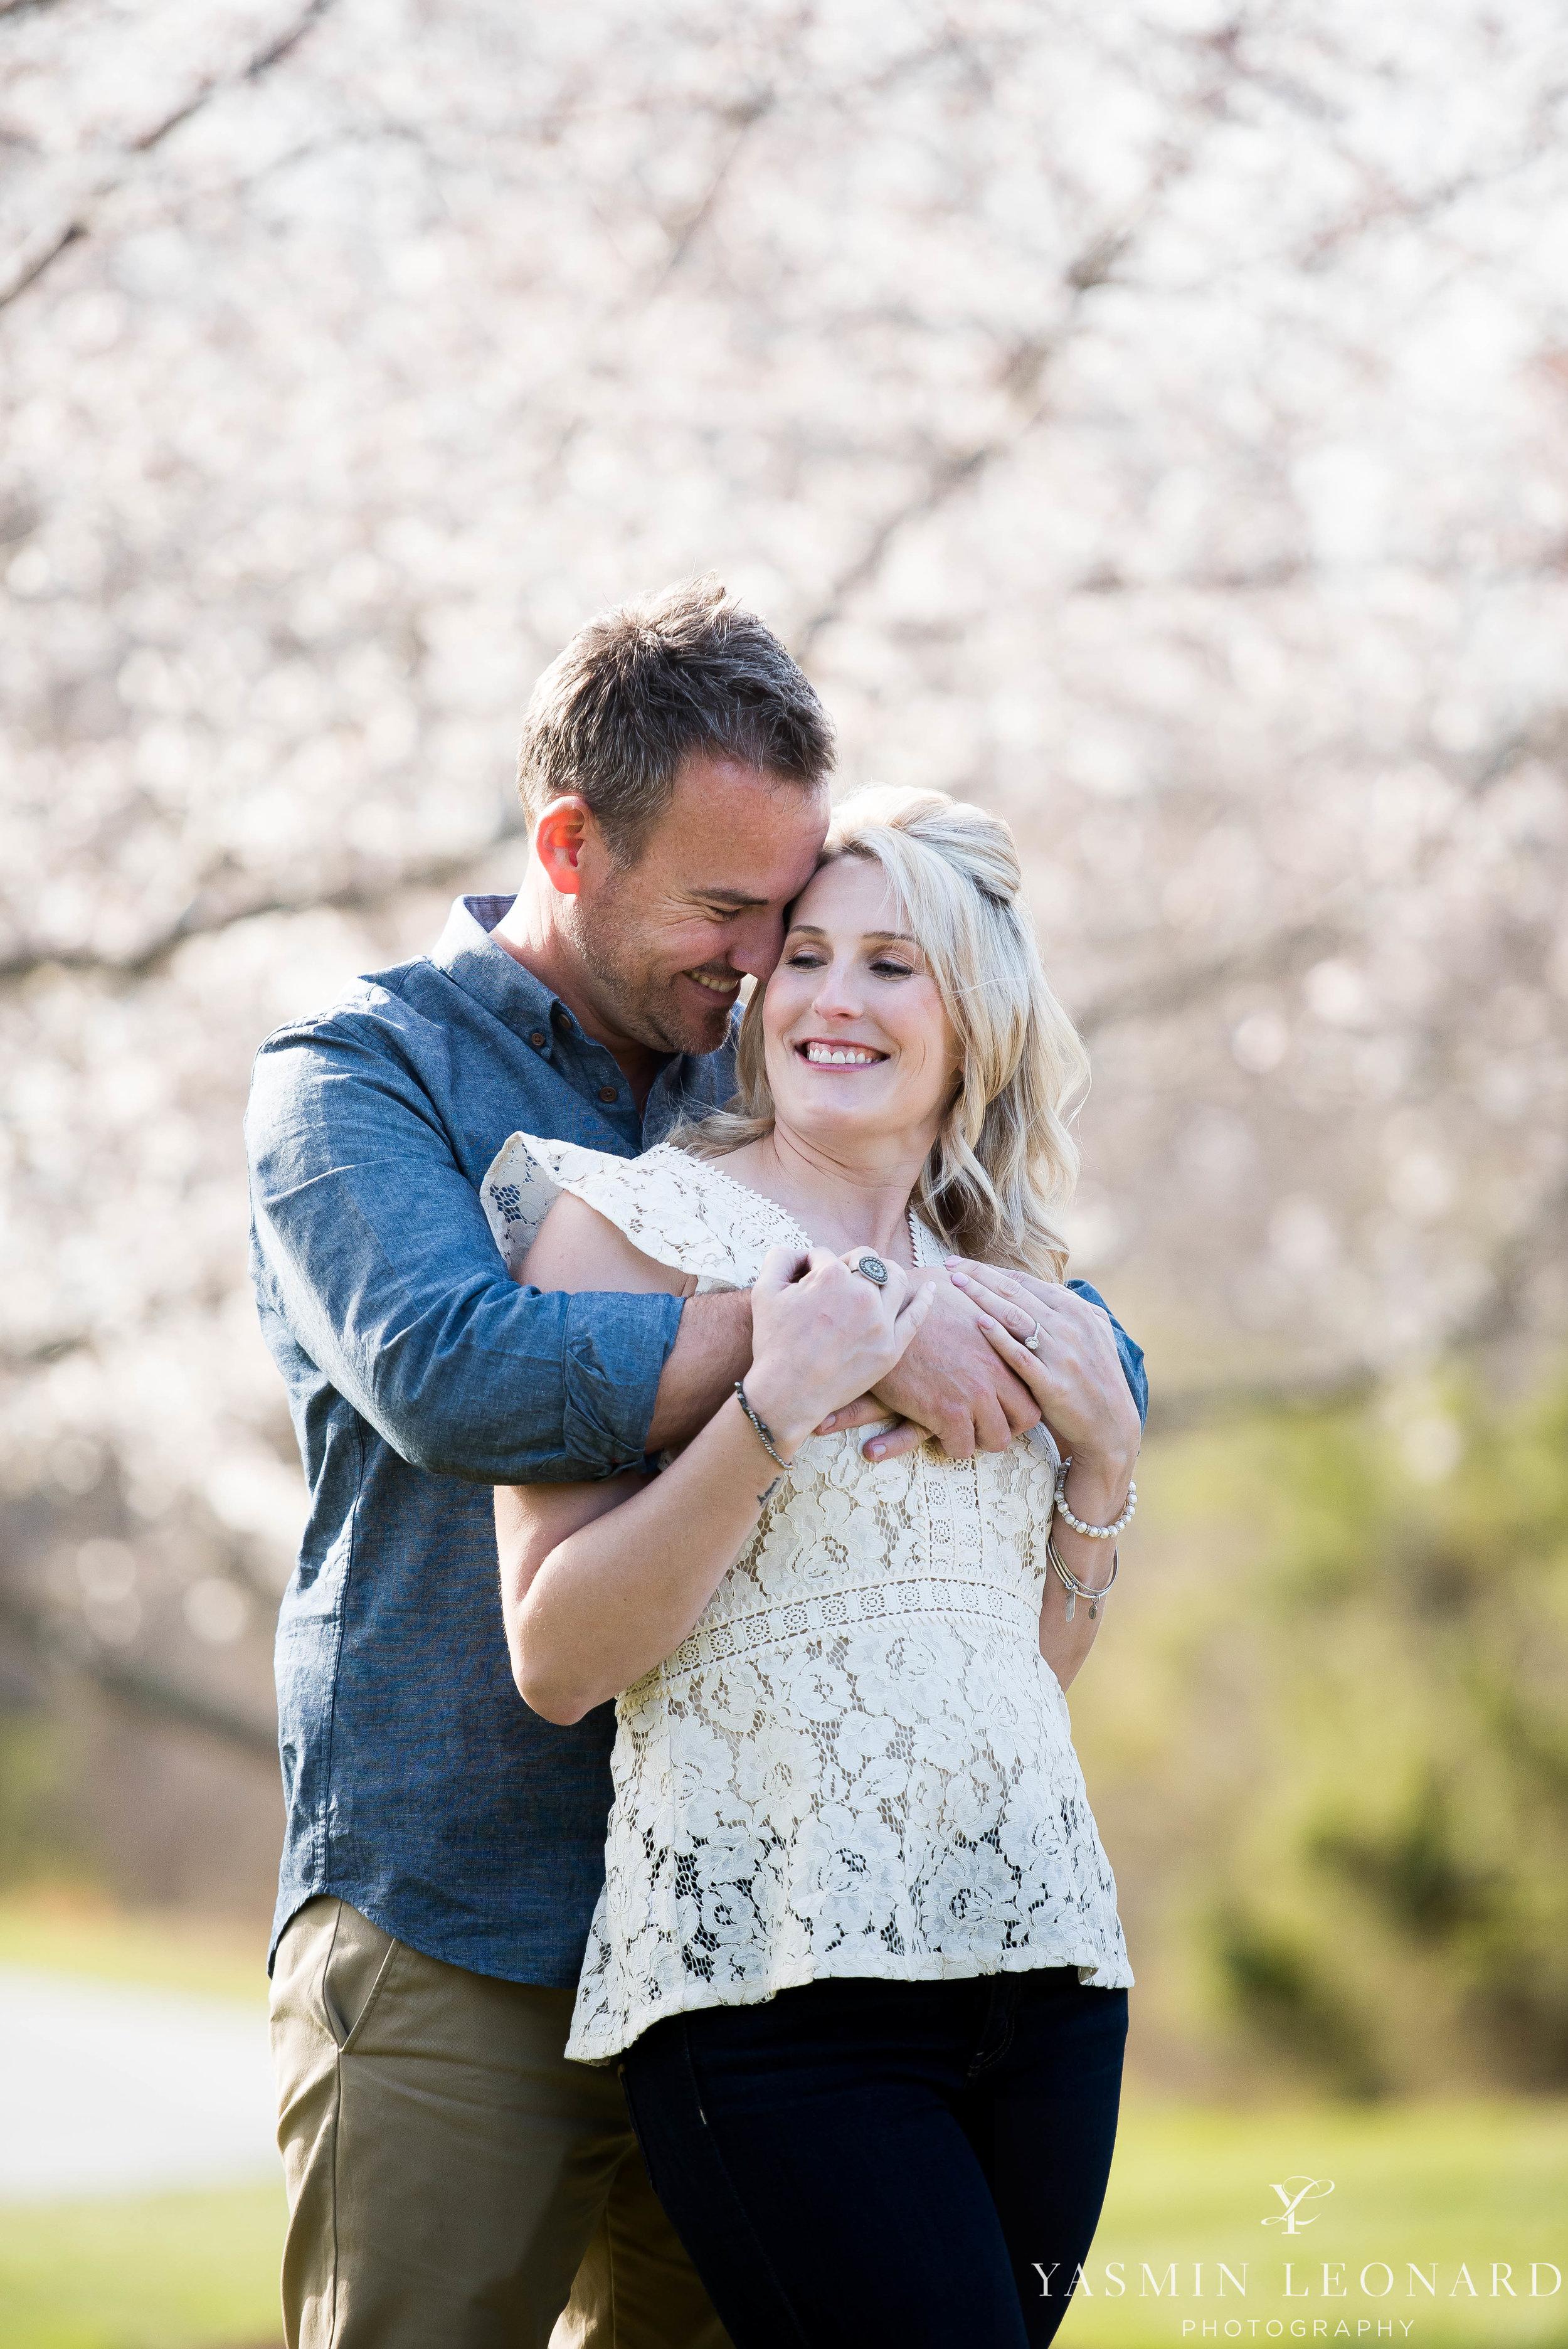 High Point Wedding Photographer - NC Wedding Photographer - Yasmin Leonard Photography - Engagement Poses - Engagement Ideas - Outdoor Engagement Session-15.jpg